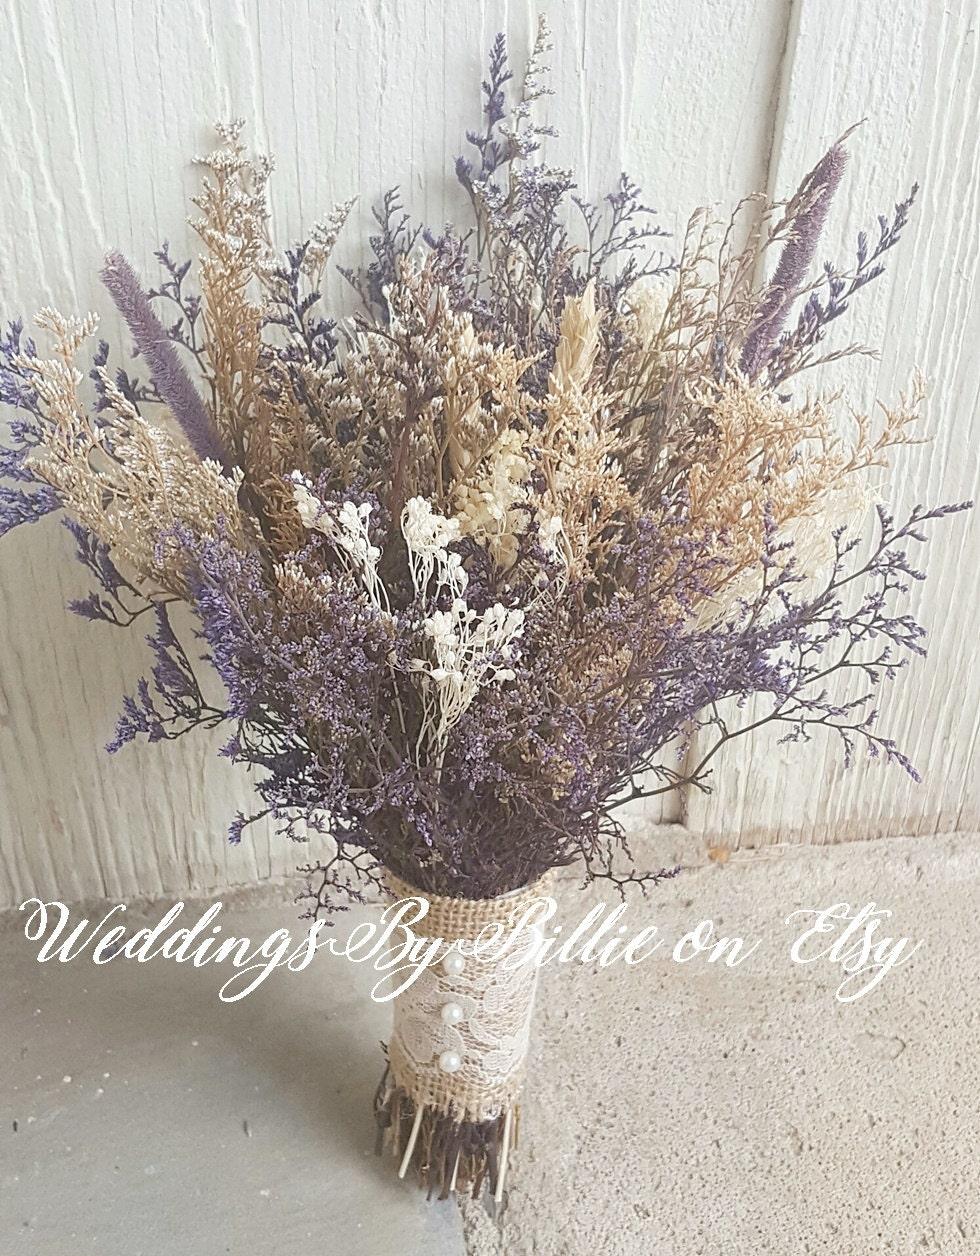 Dried flower bouquet lavender wheat caspia babies breath etsy zoom izmirmasajfo